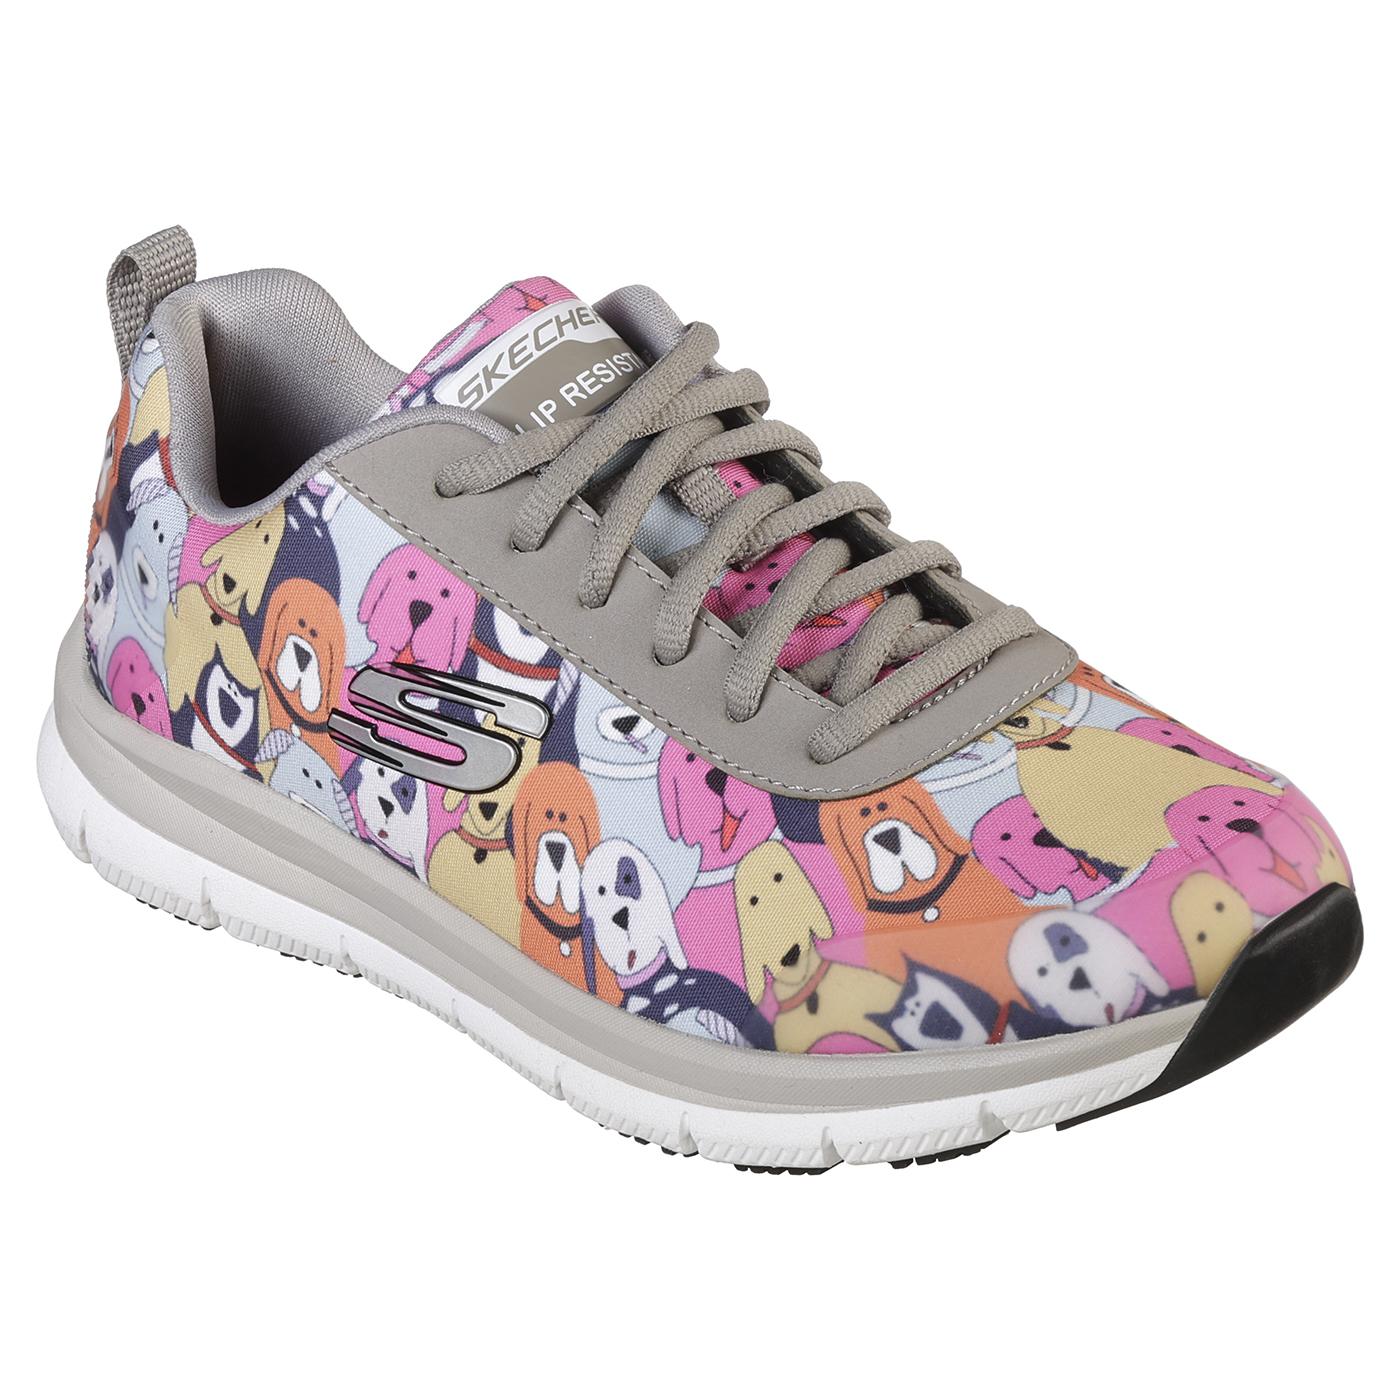 skechers slip resistant shoes womens